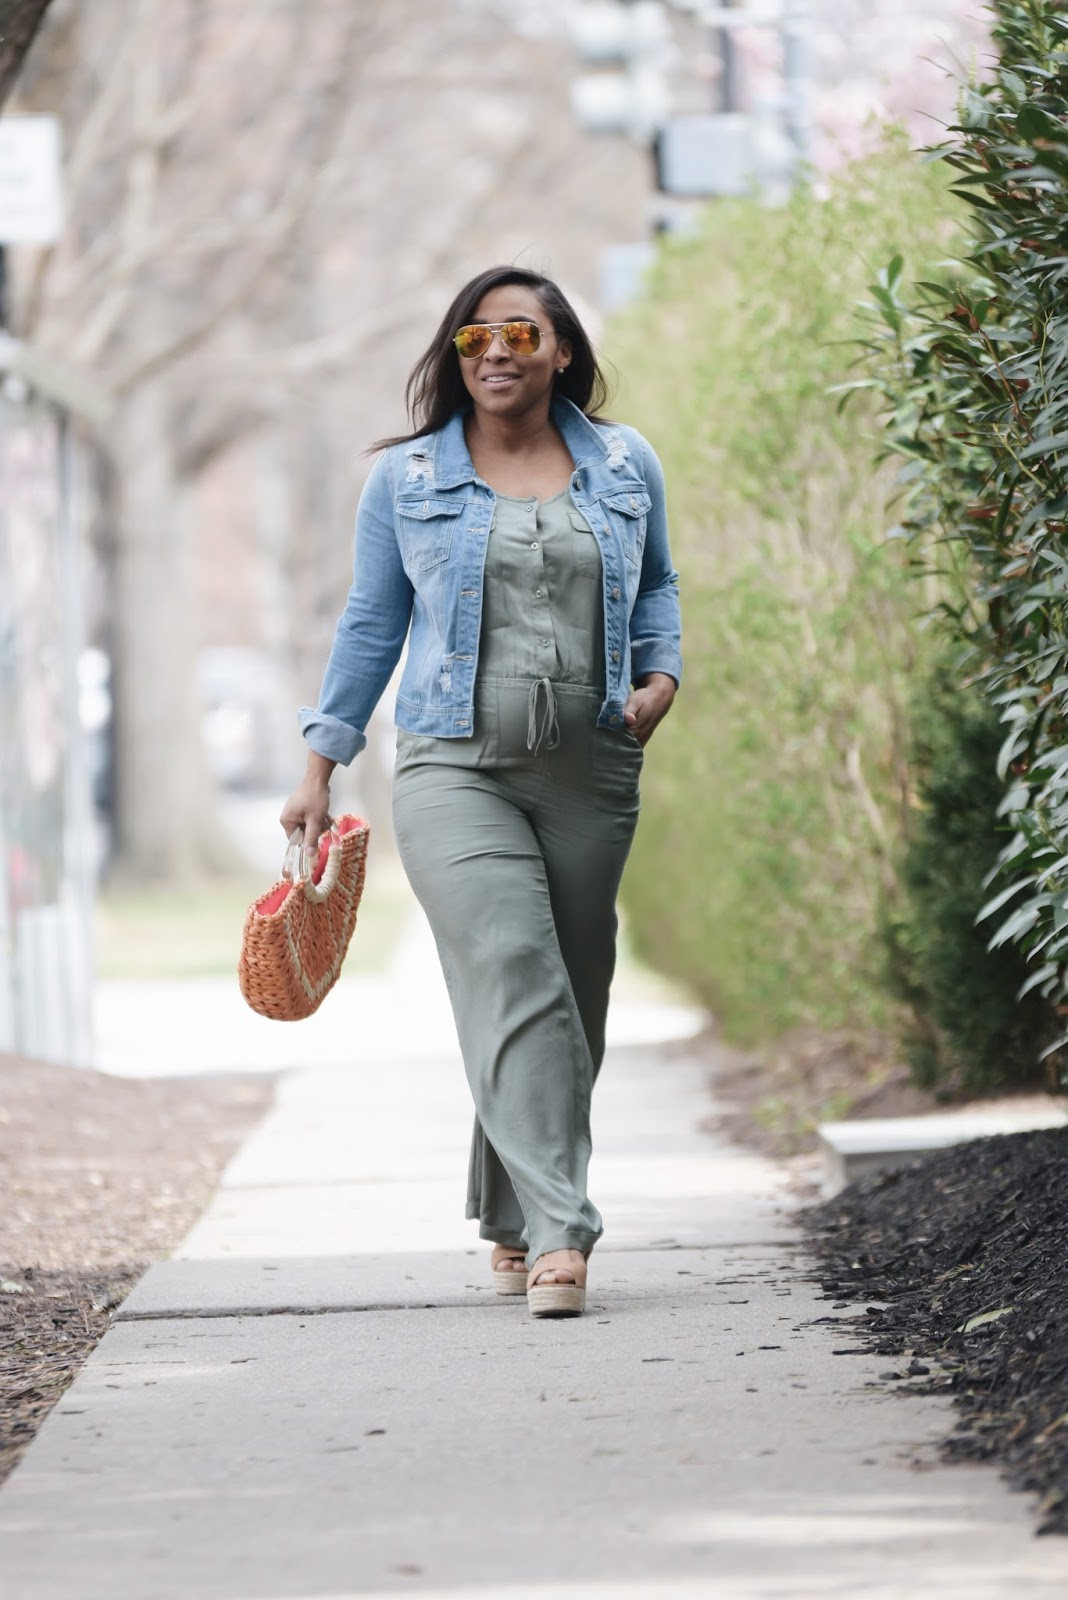 Mom blogger, denim jacket, kate spade bags, pregnant fashion, fashion blogger, pregnant in heels, maternity fashion, spring bags